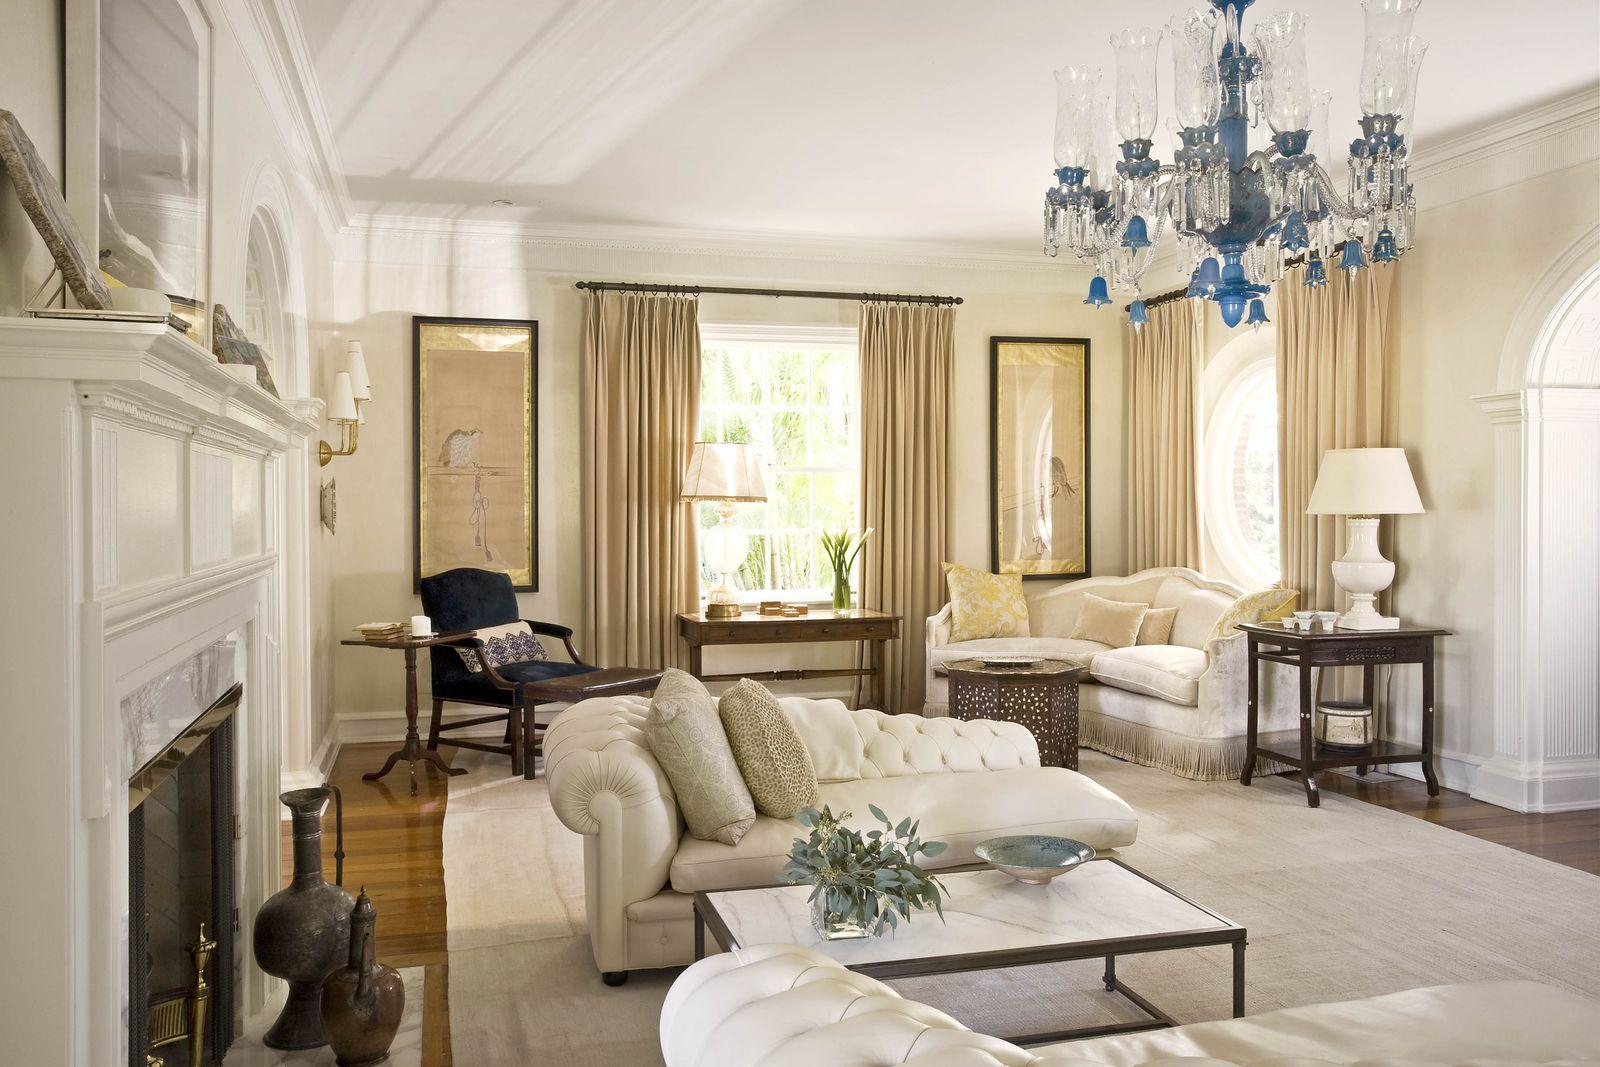 Luxurious living room decor ideas for the house pinterest room